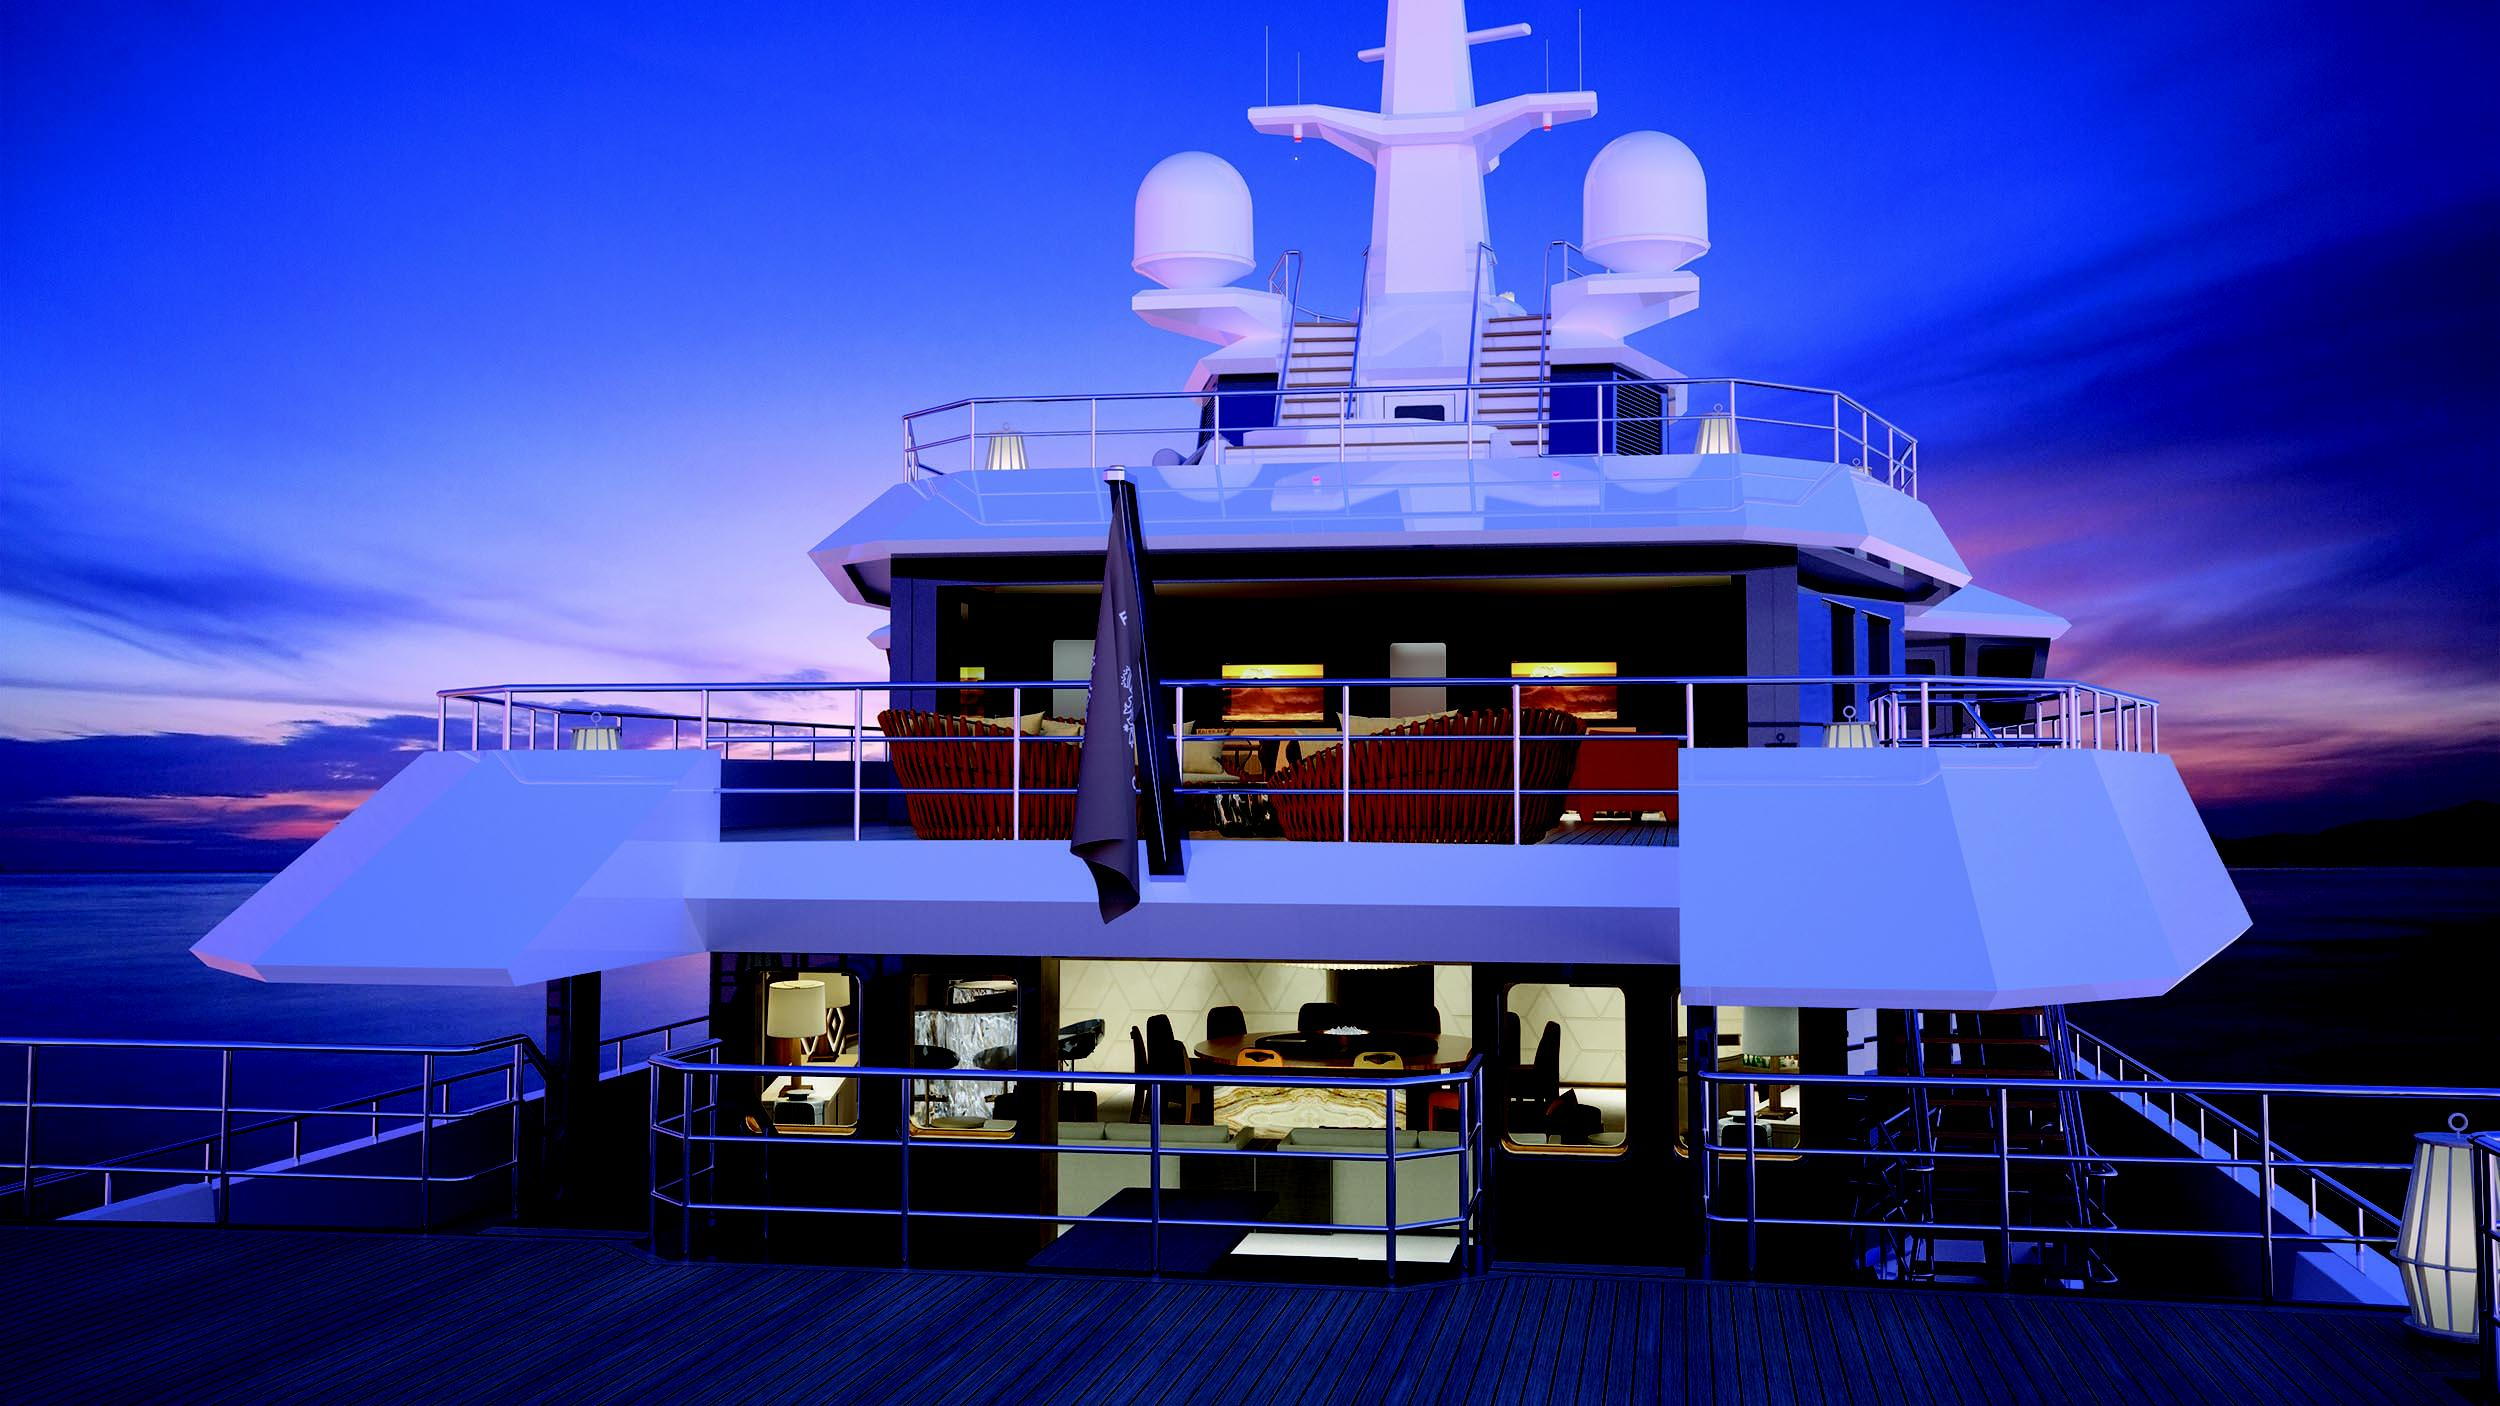 seaxplorer 77 motoryacht damen 77m 2020 rendering aft decks